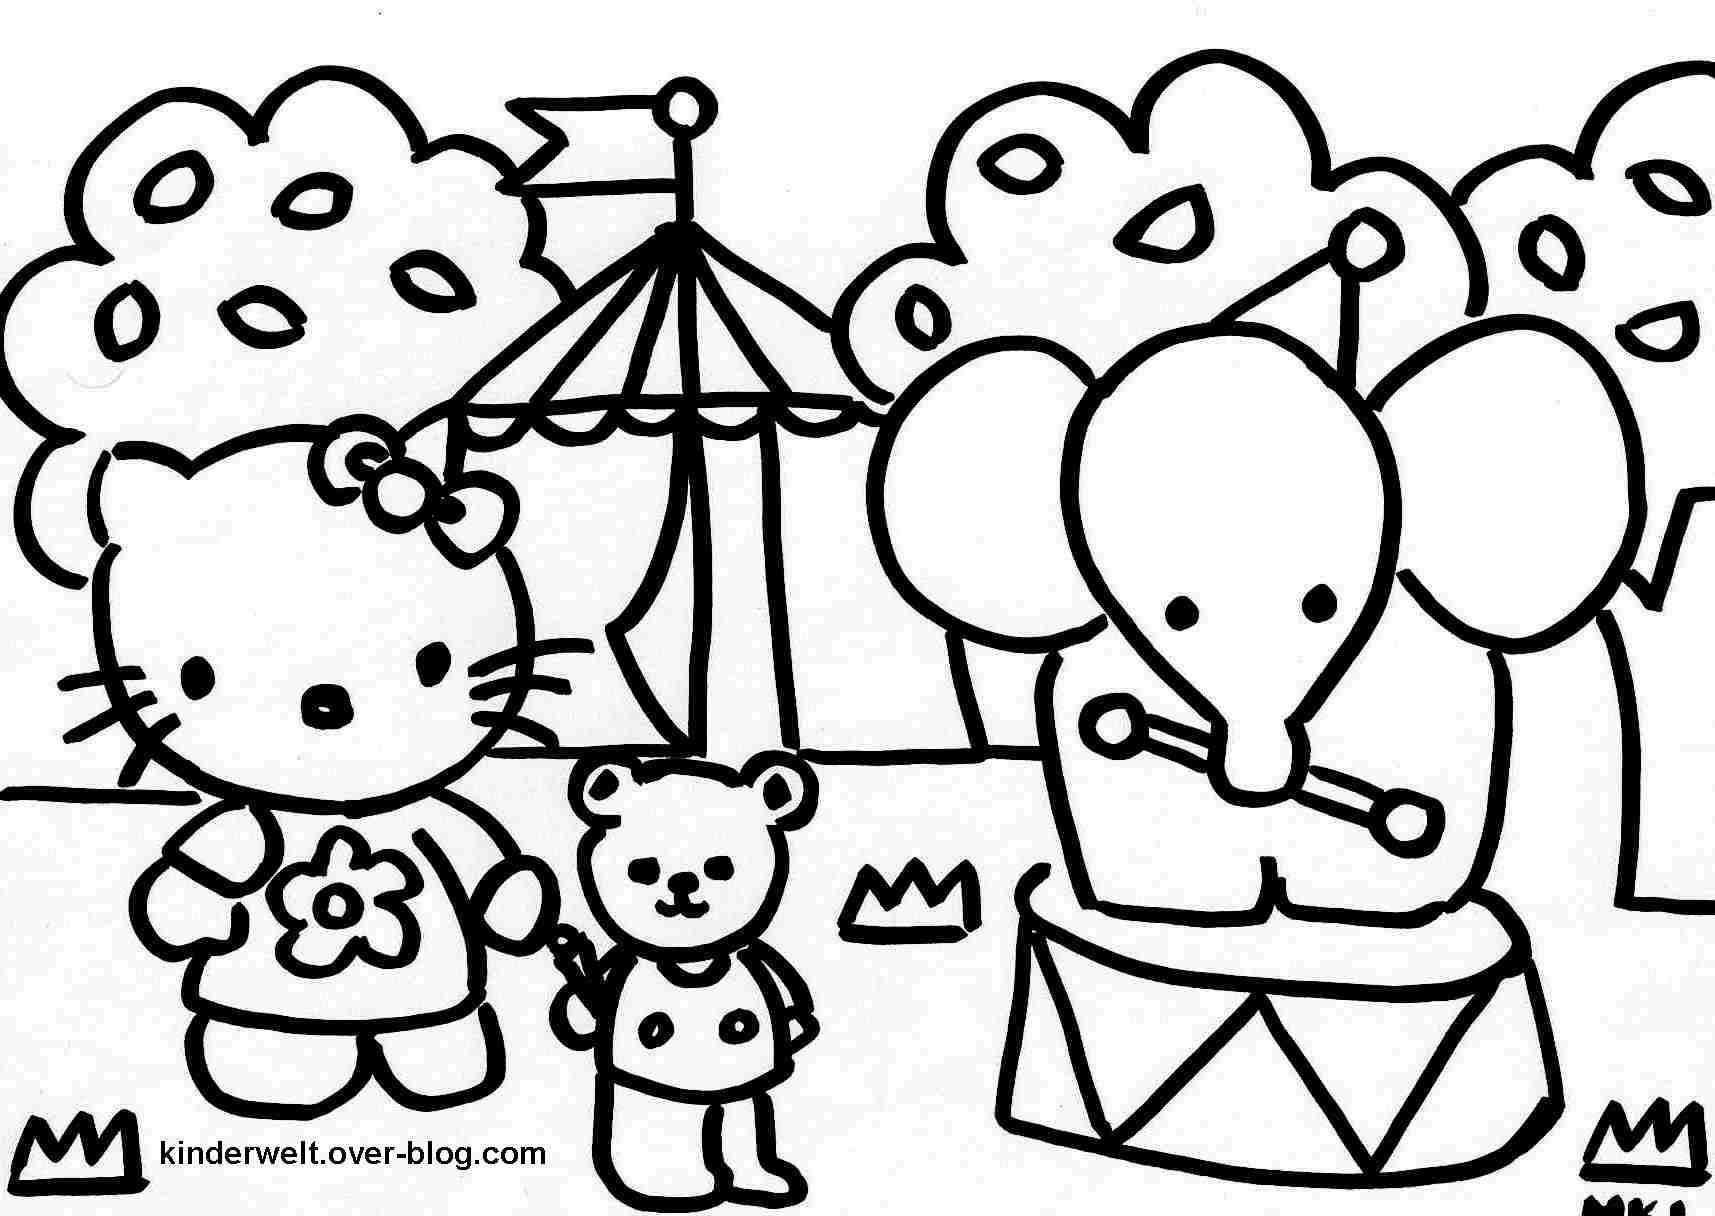 Hello Kitty Ausmalbilder Ausmalbilder Fur Kinder Ausmalbilder Ausmalbilder Hello Kitty Hello Kitty